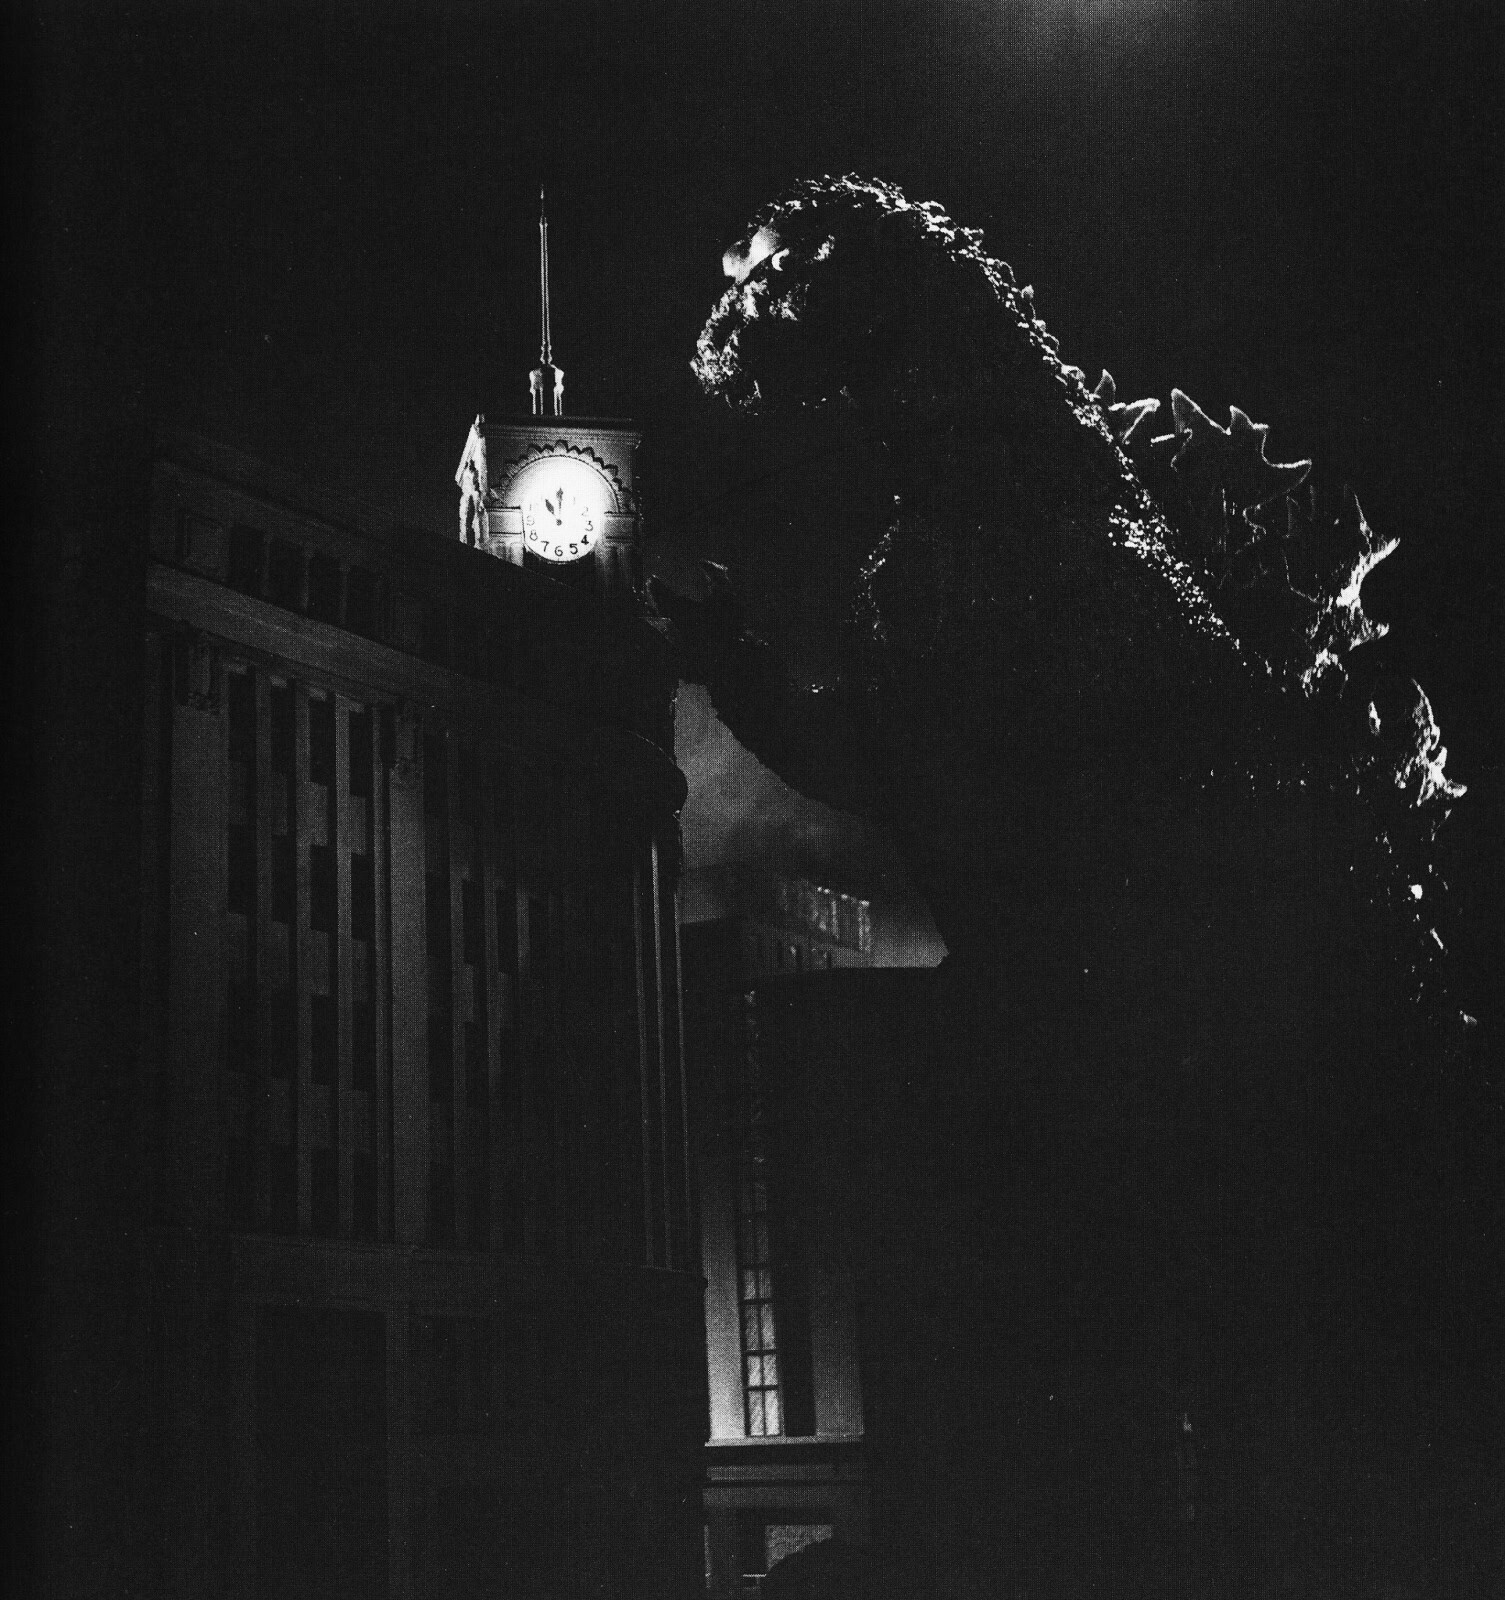 W.I.P. 1954 Godzilla Attack Tokyo Clock Tower Diorama  https://www.solidart.club/